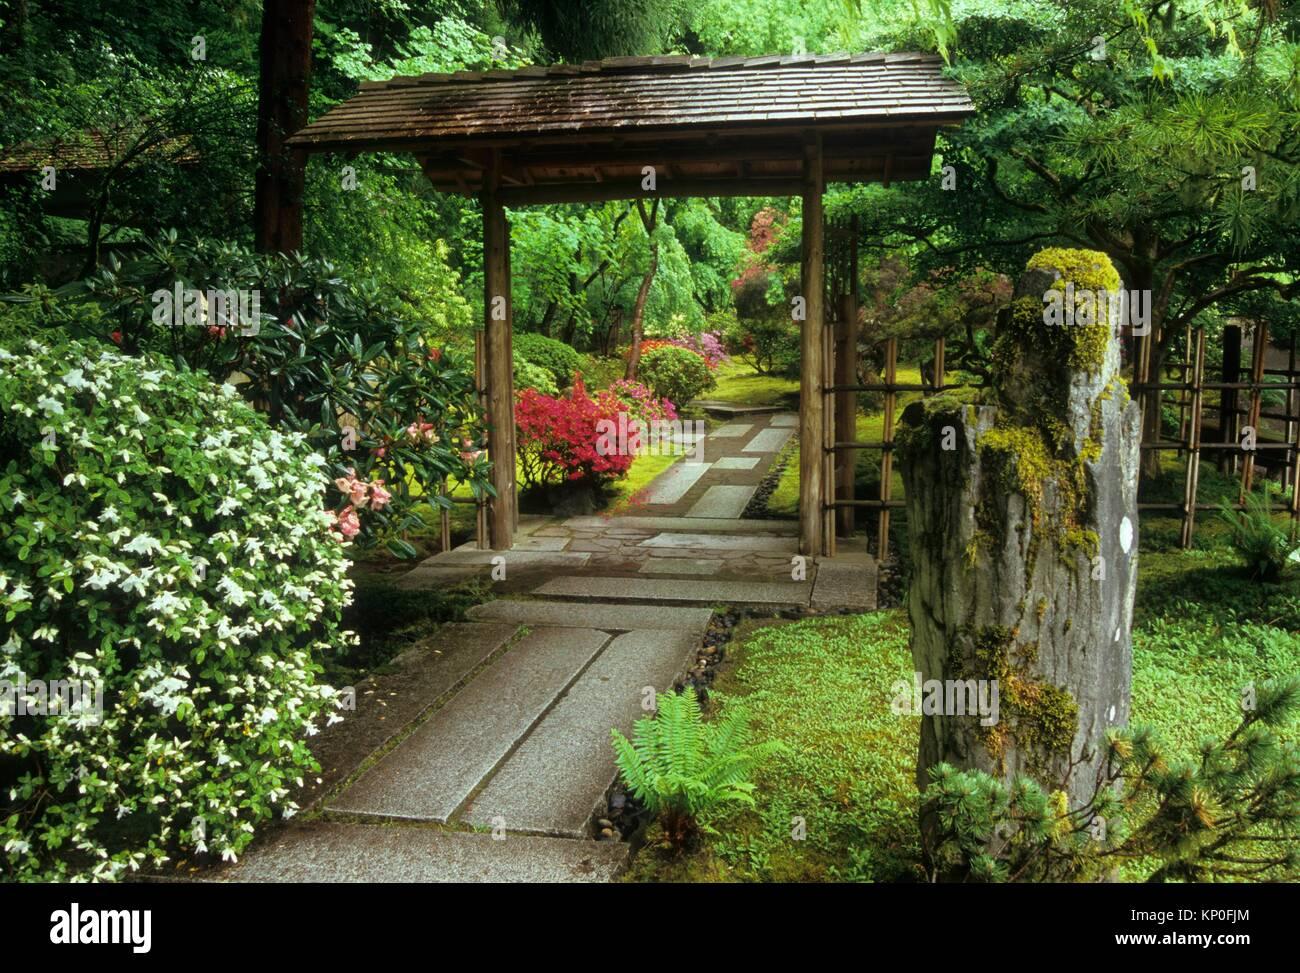 Jardin Japonais De Portland Photos & Jardin Japonais De ...